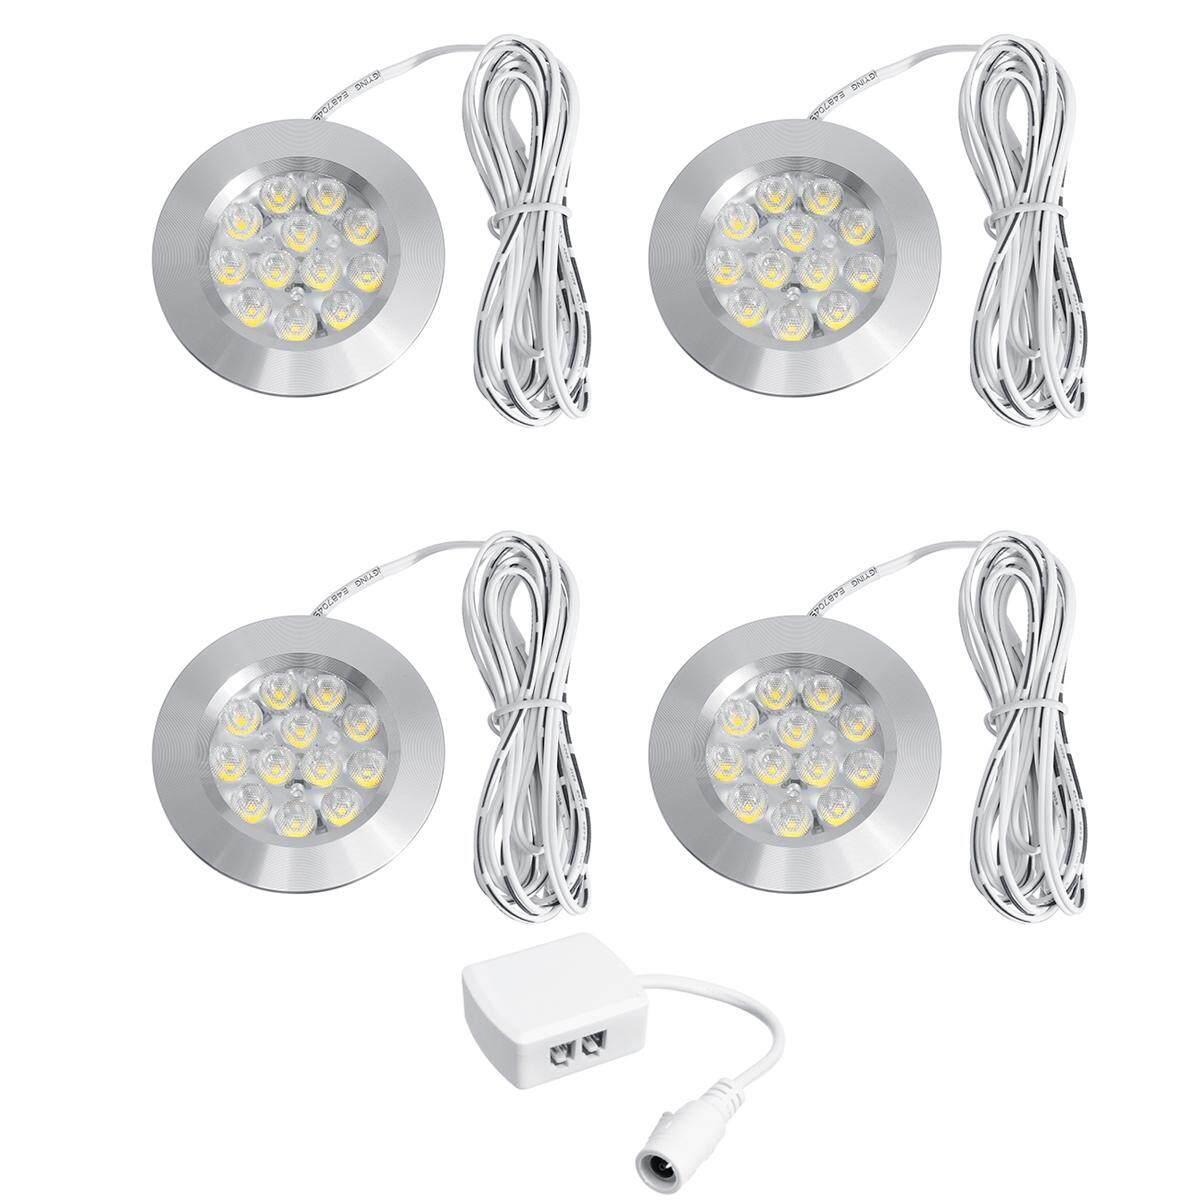 4pcs 12V Recessed LED Down Light Caravan Camper Trailer Car Cabin Ceiling Lamp Warm White